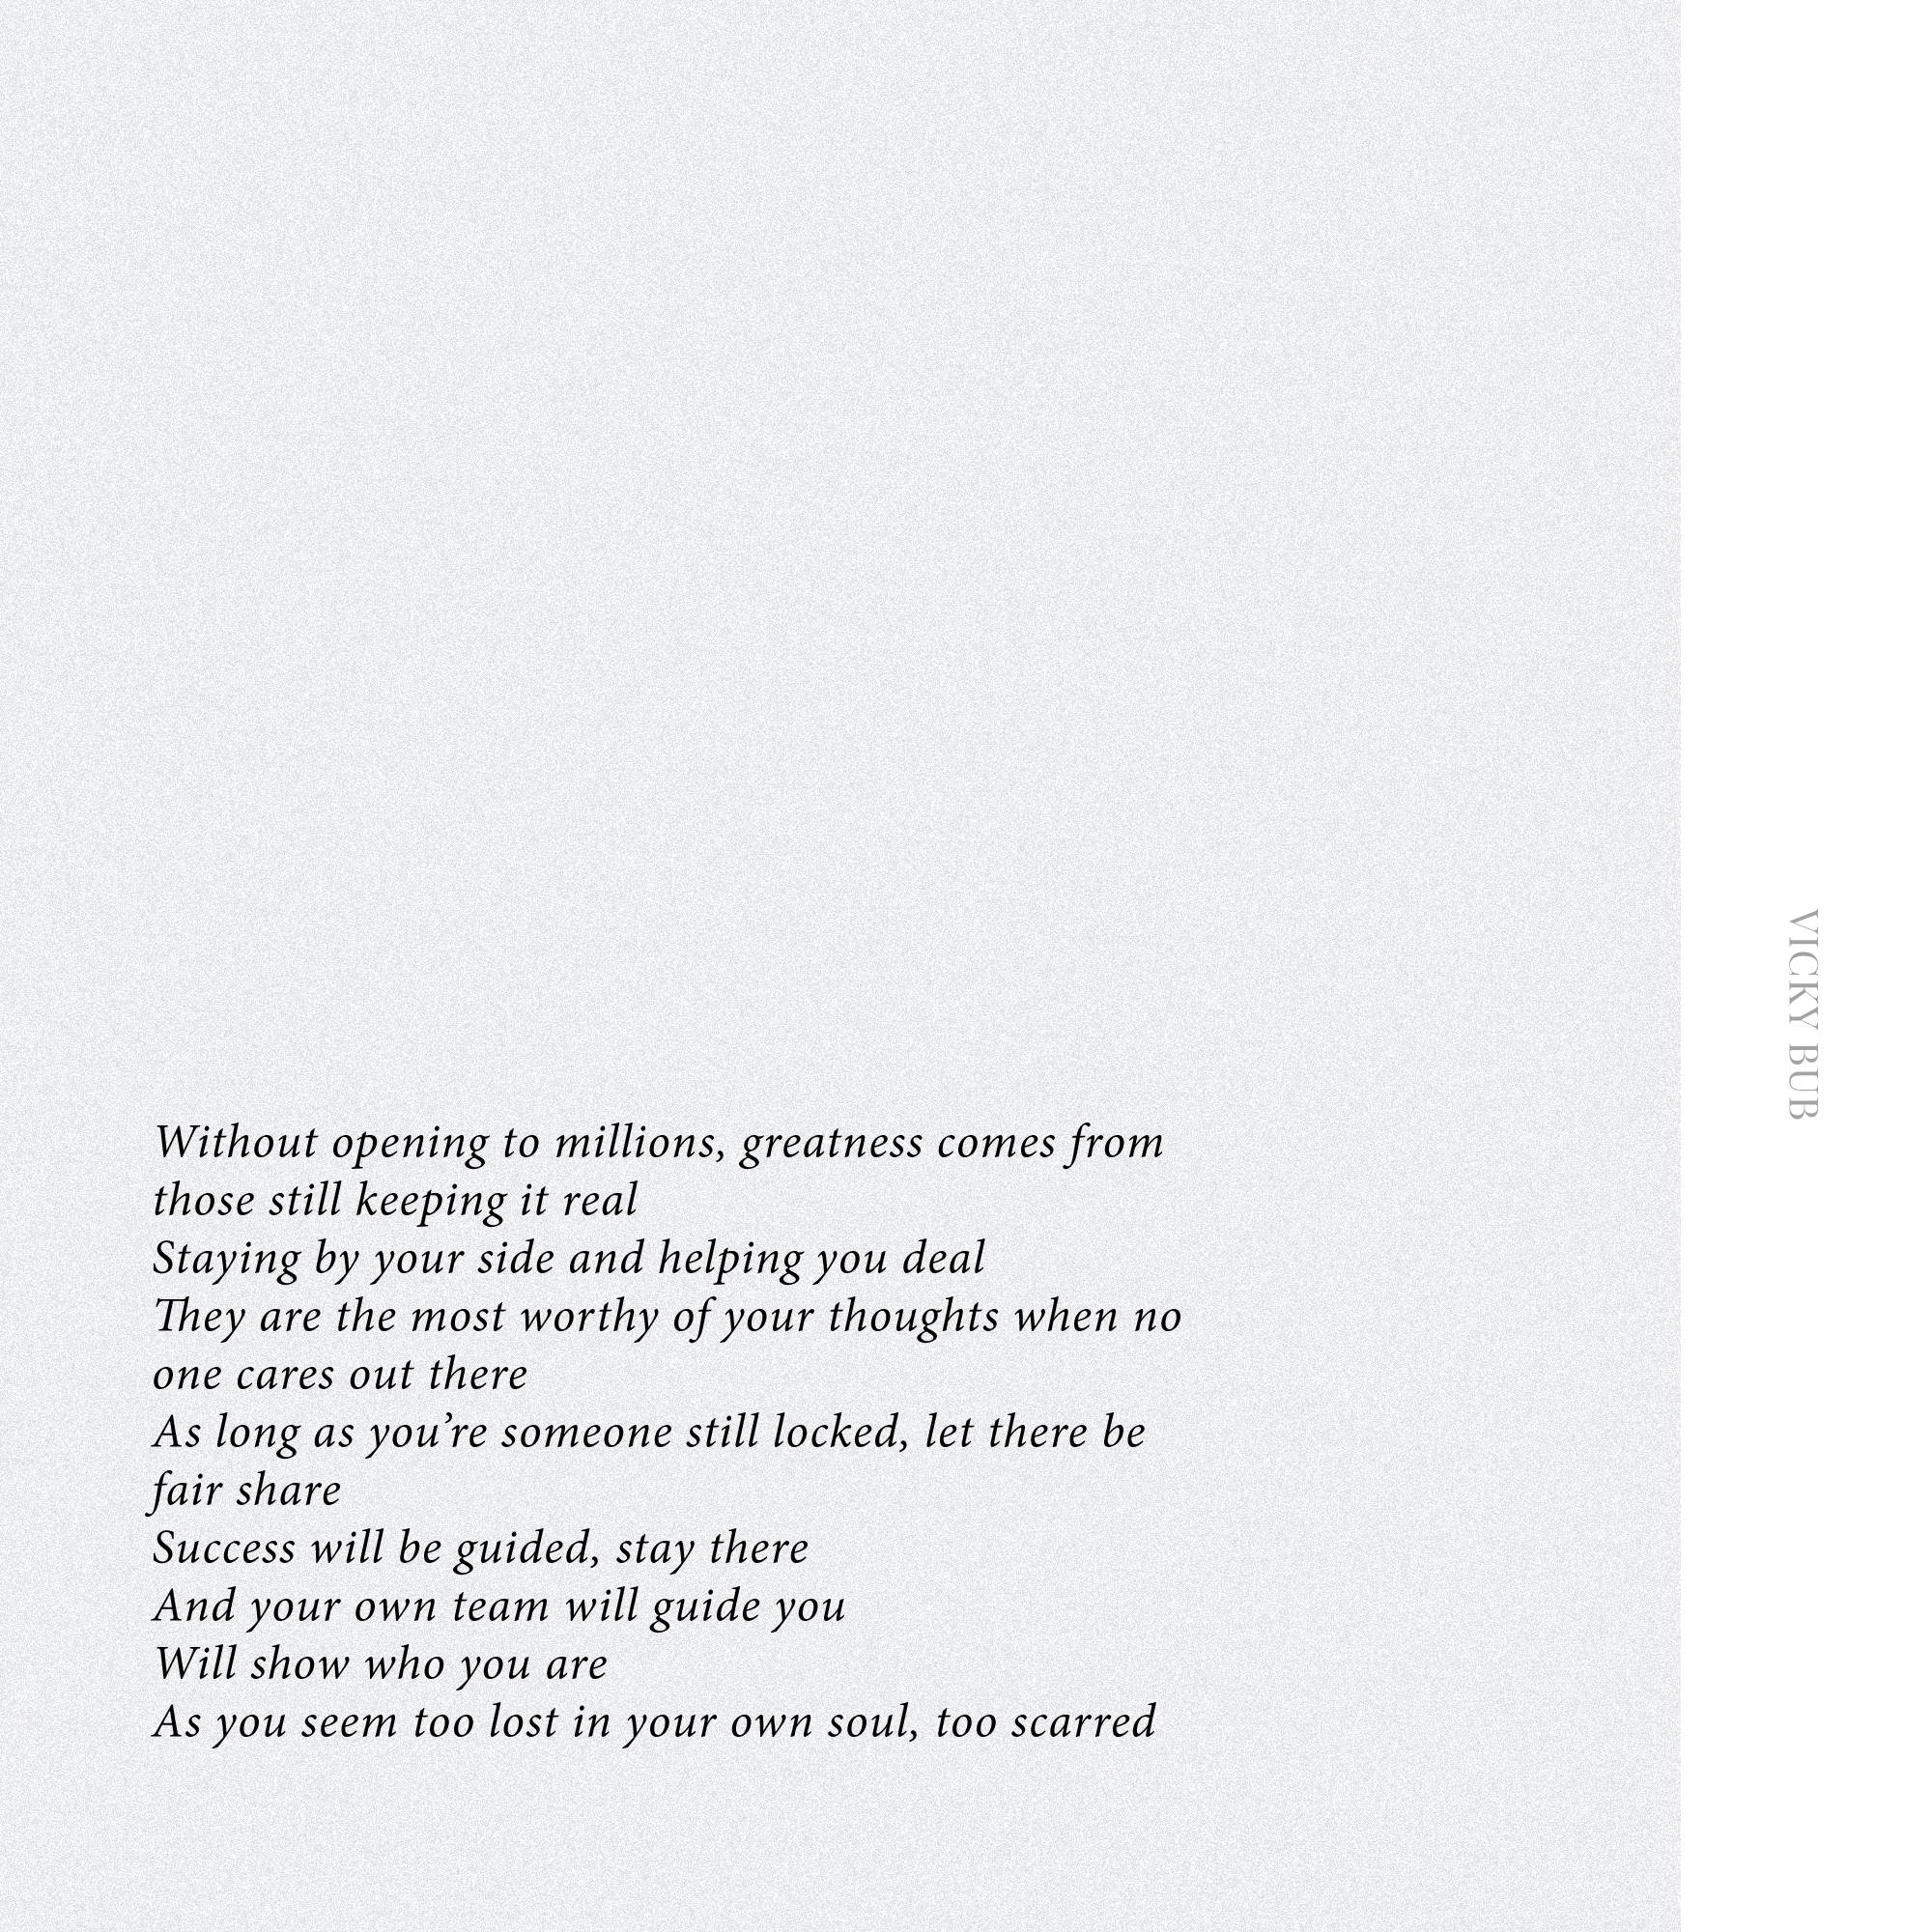 pg3-5